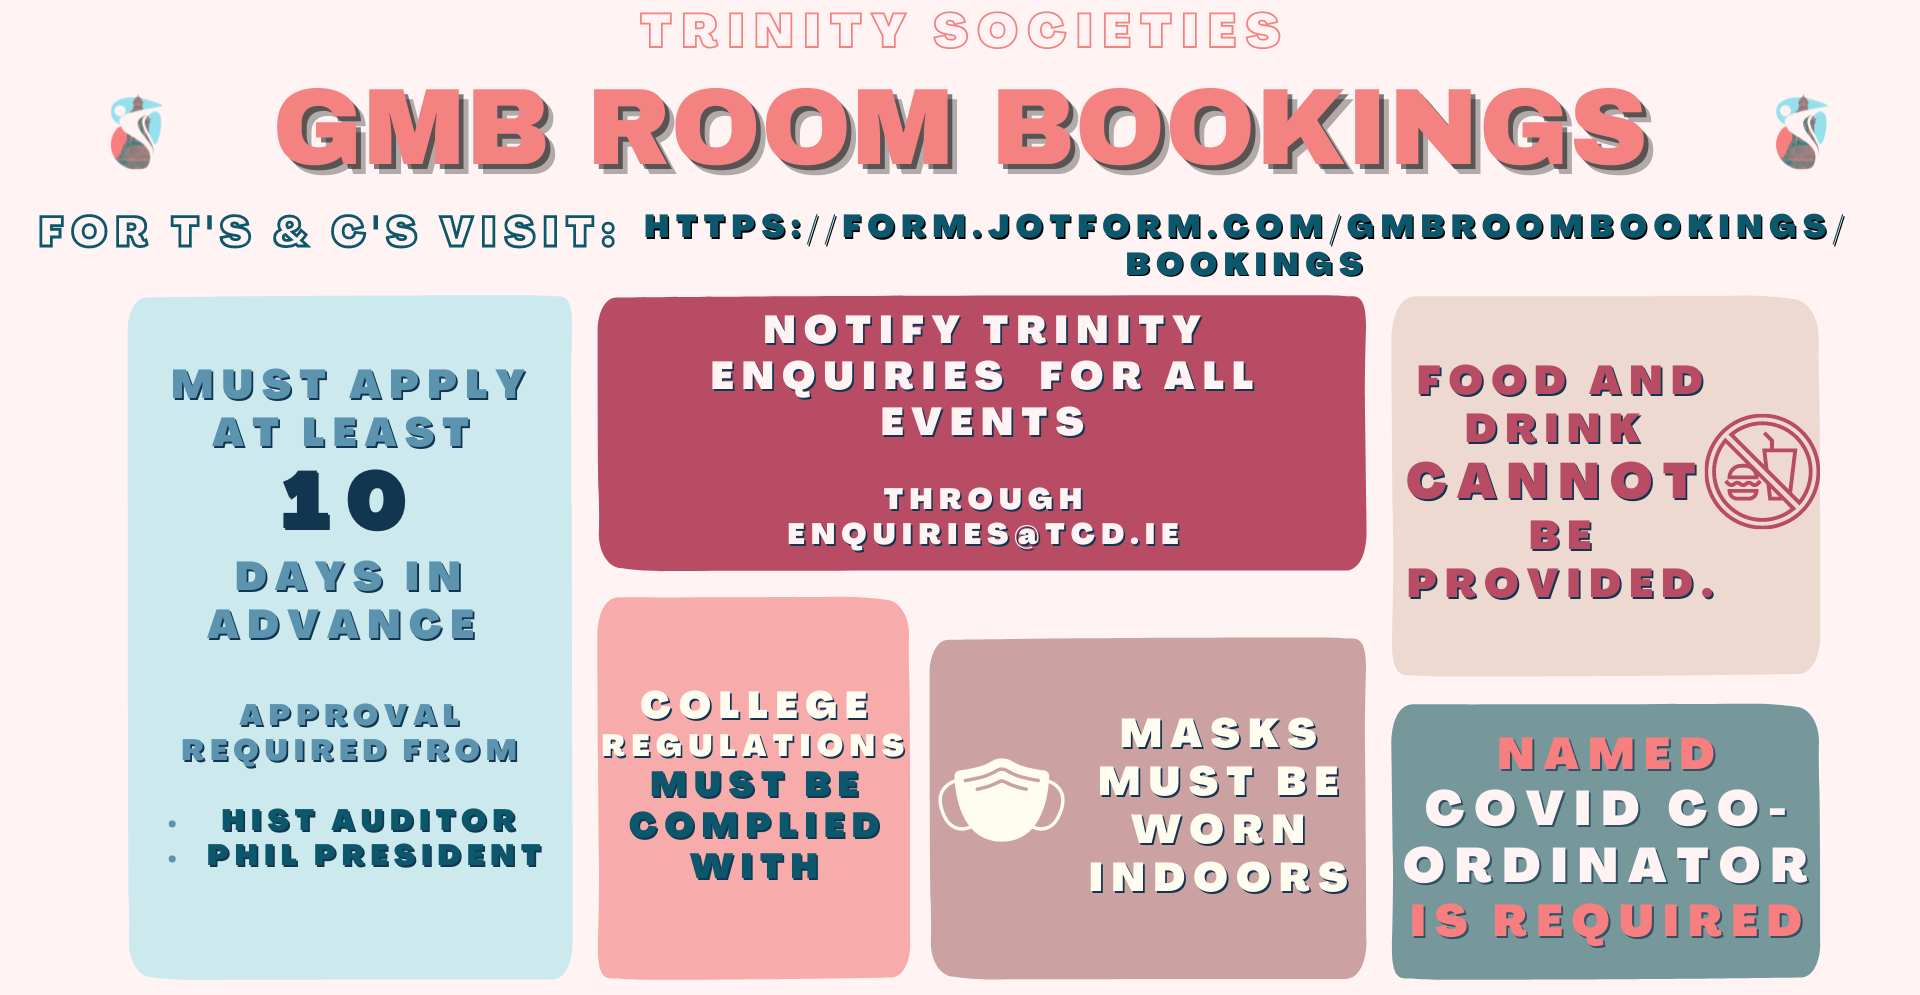 gmb indoor booking Ts Cs